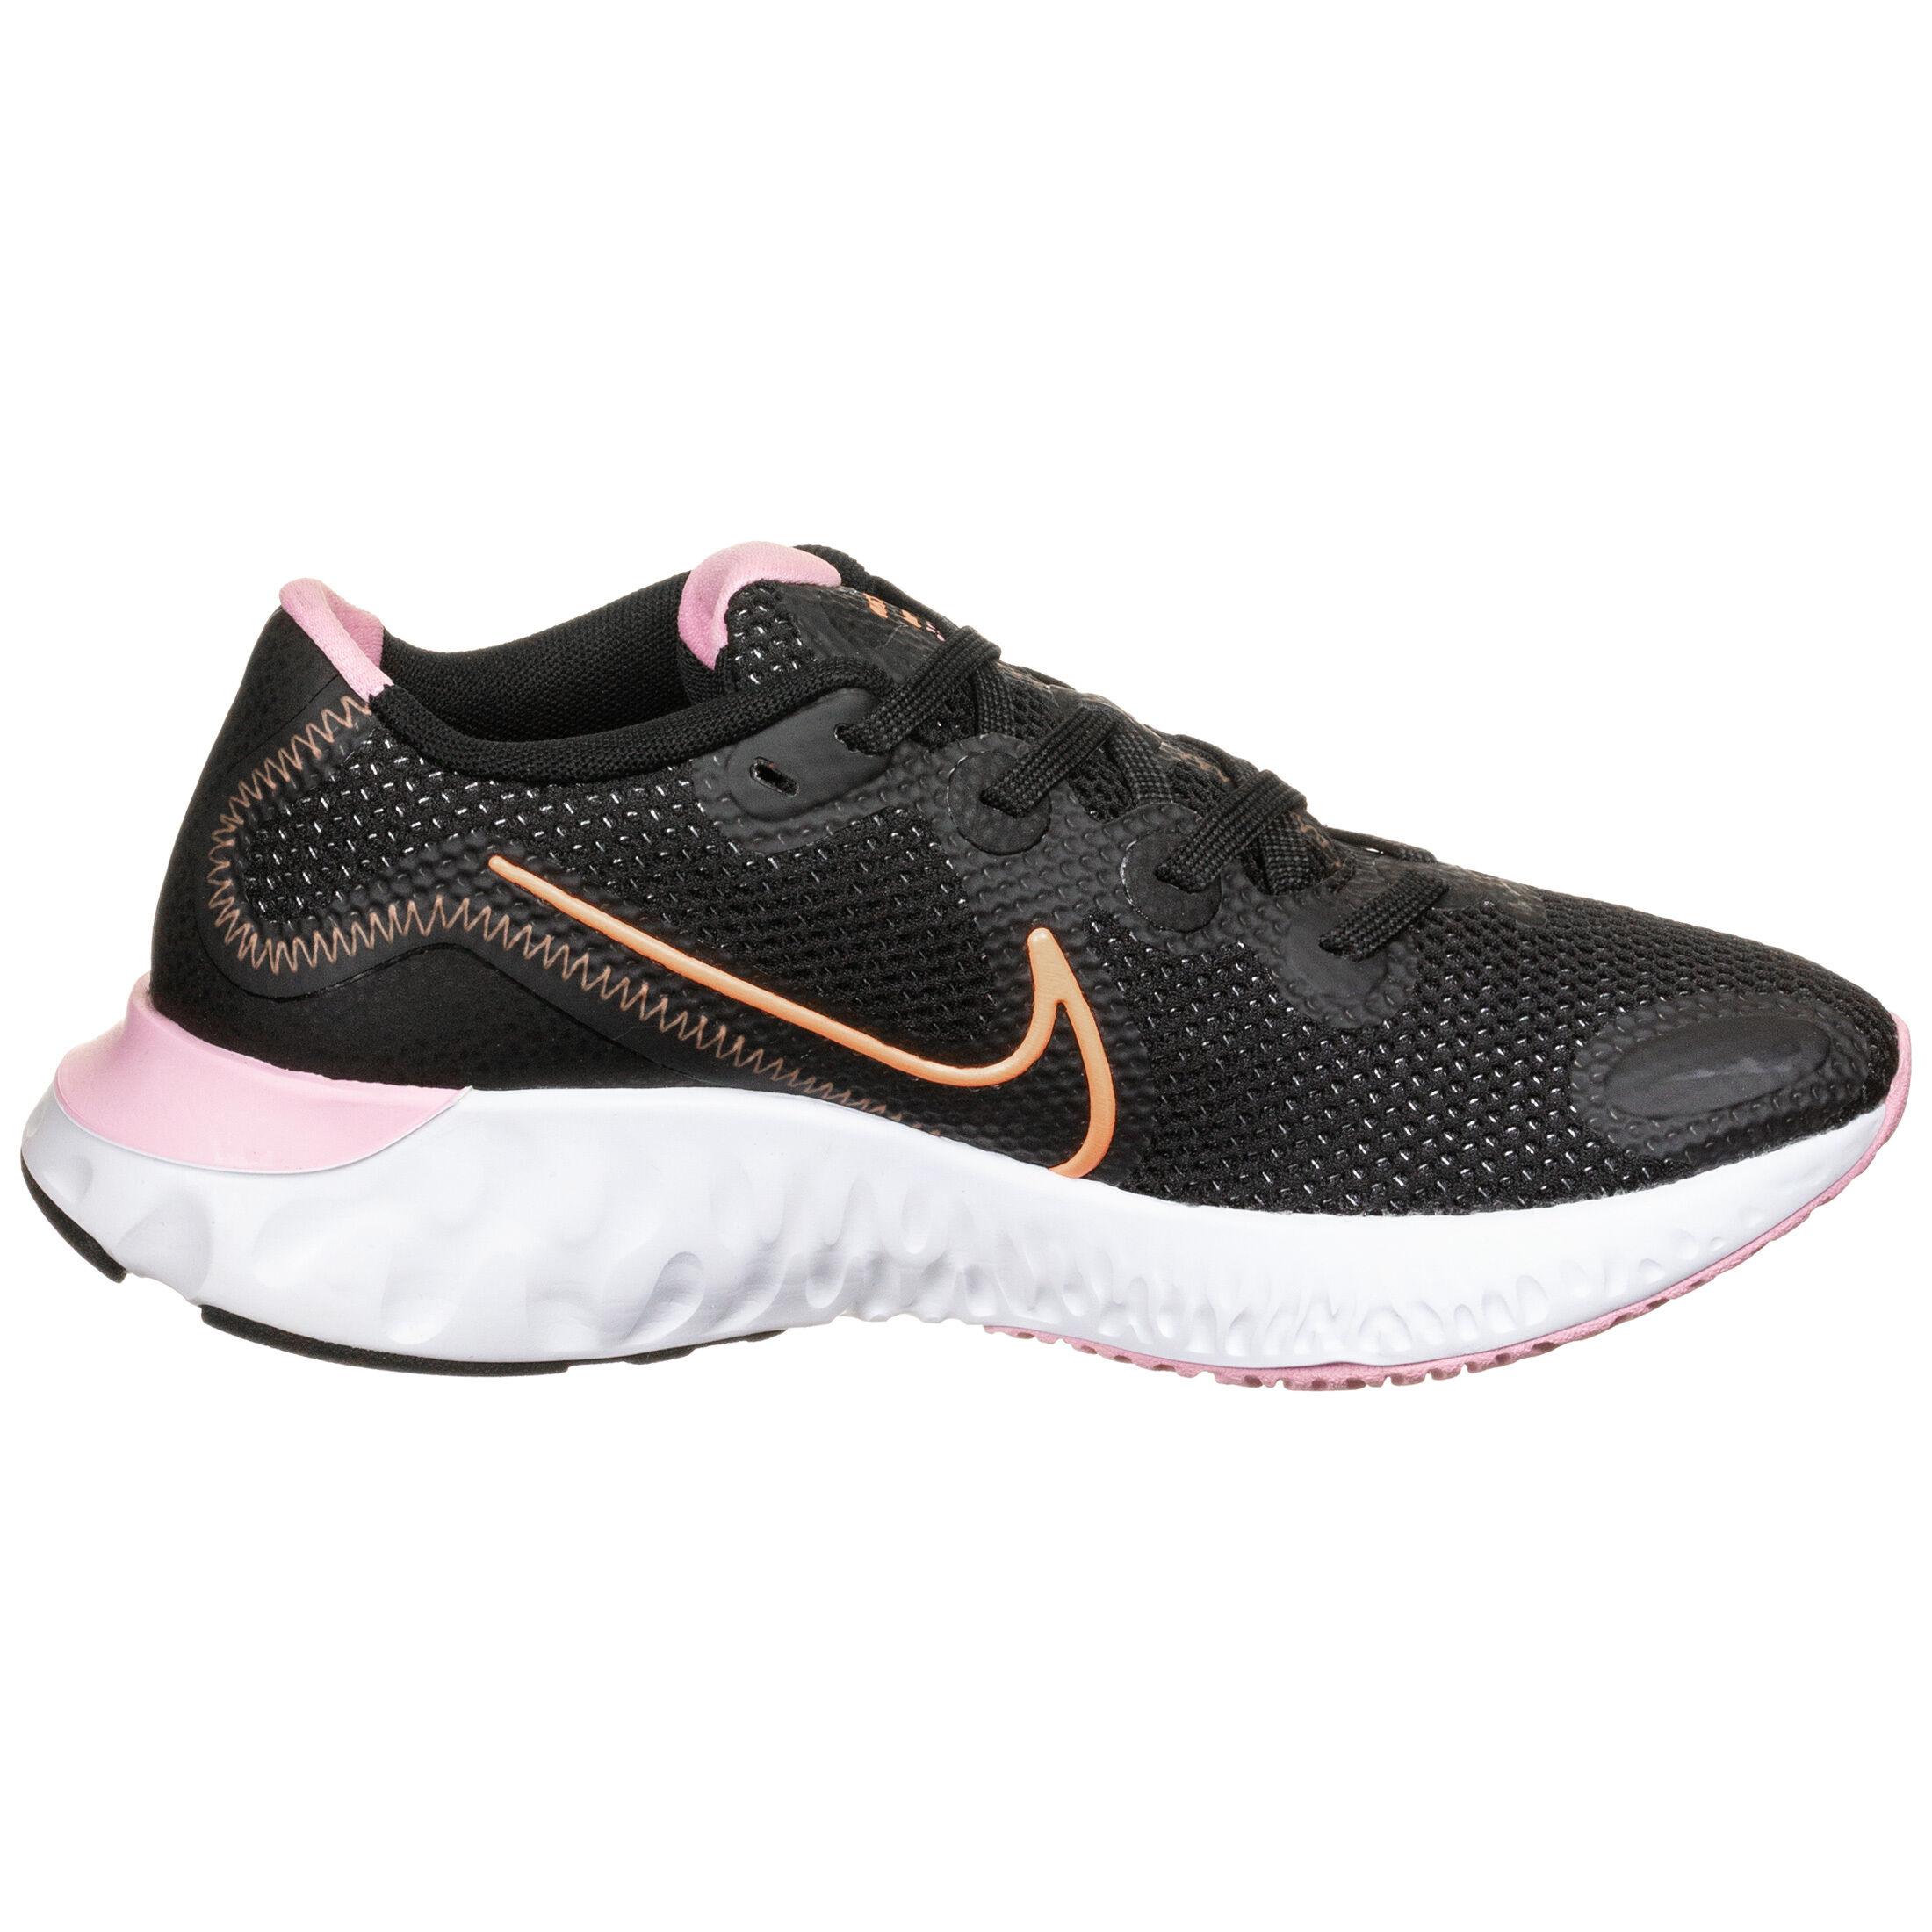 Nike Performance Renew Run Laufschuh Damen bei OUTFITTER